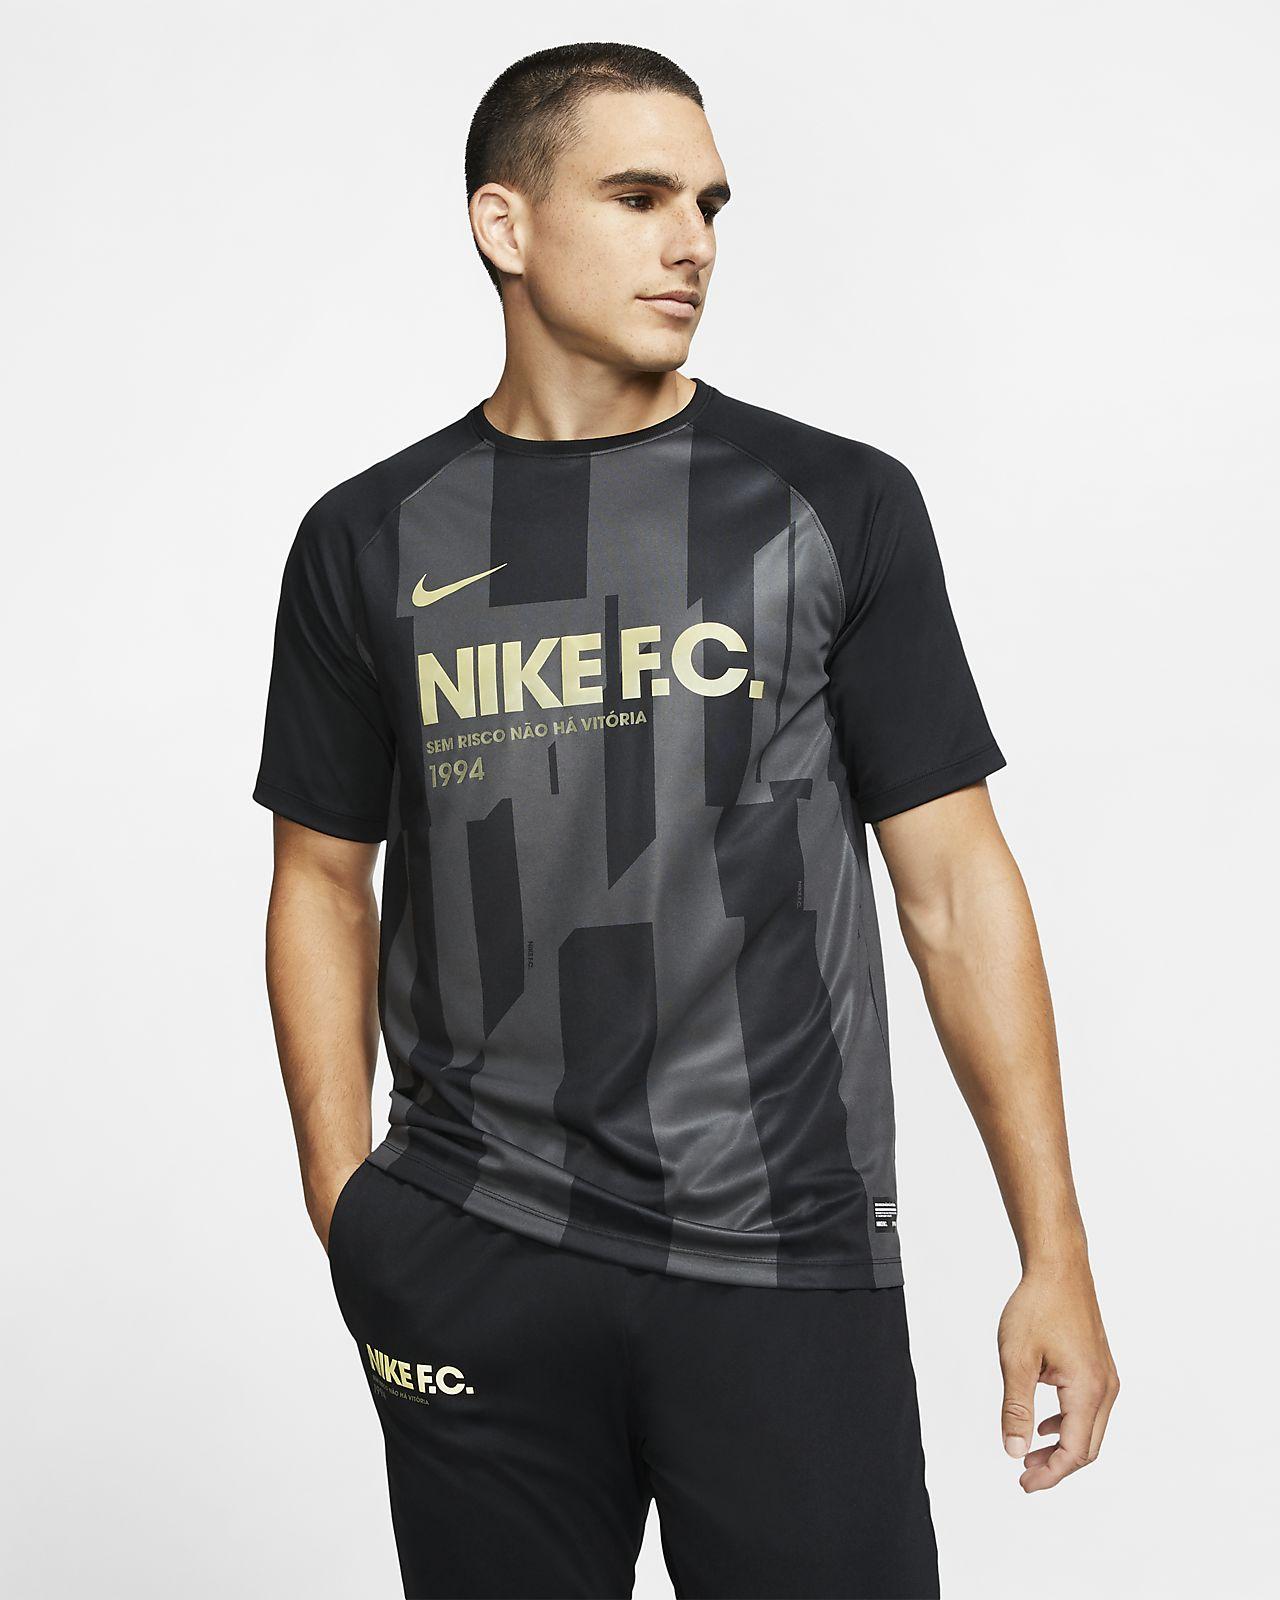 Męska koszulka z krótkim rękawem Nike F.C.